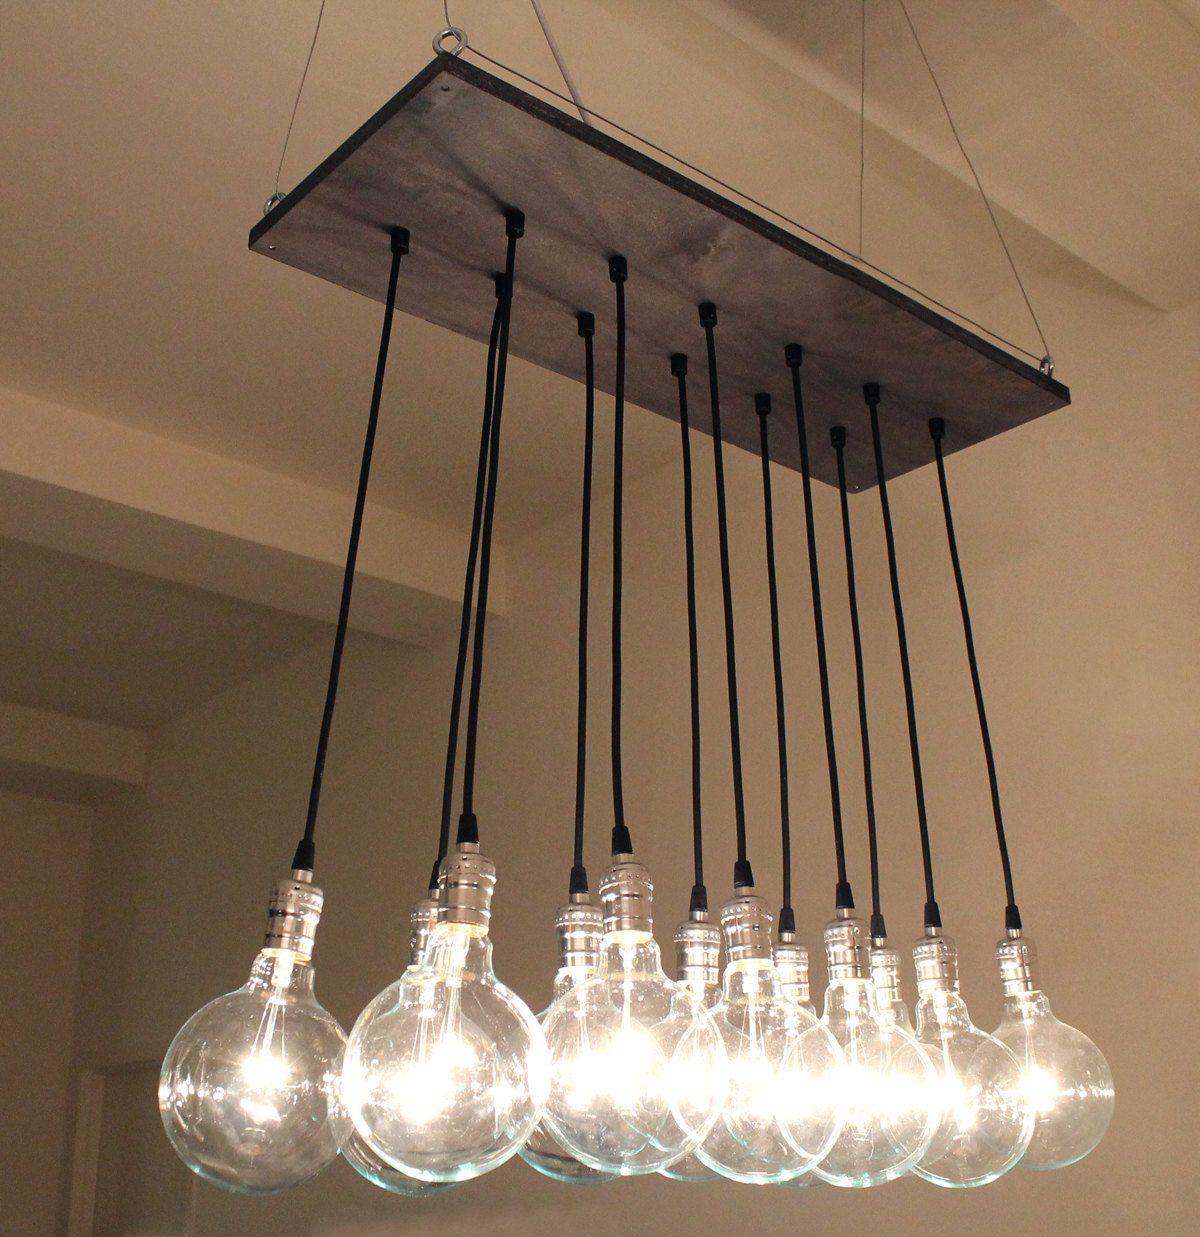 industrial chandelier – Industrial Chandeliers